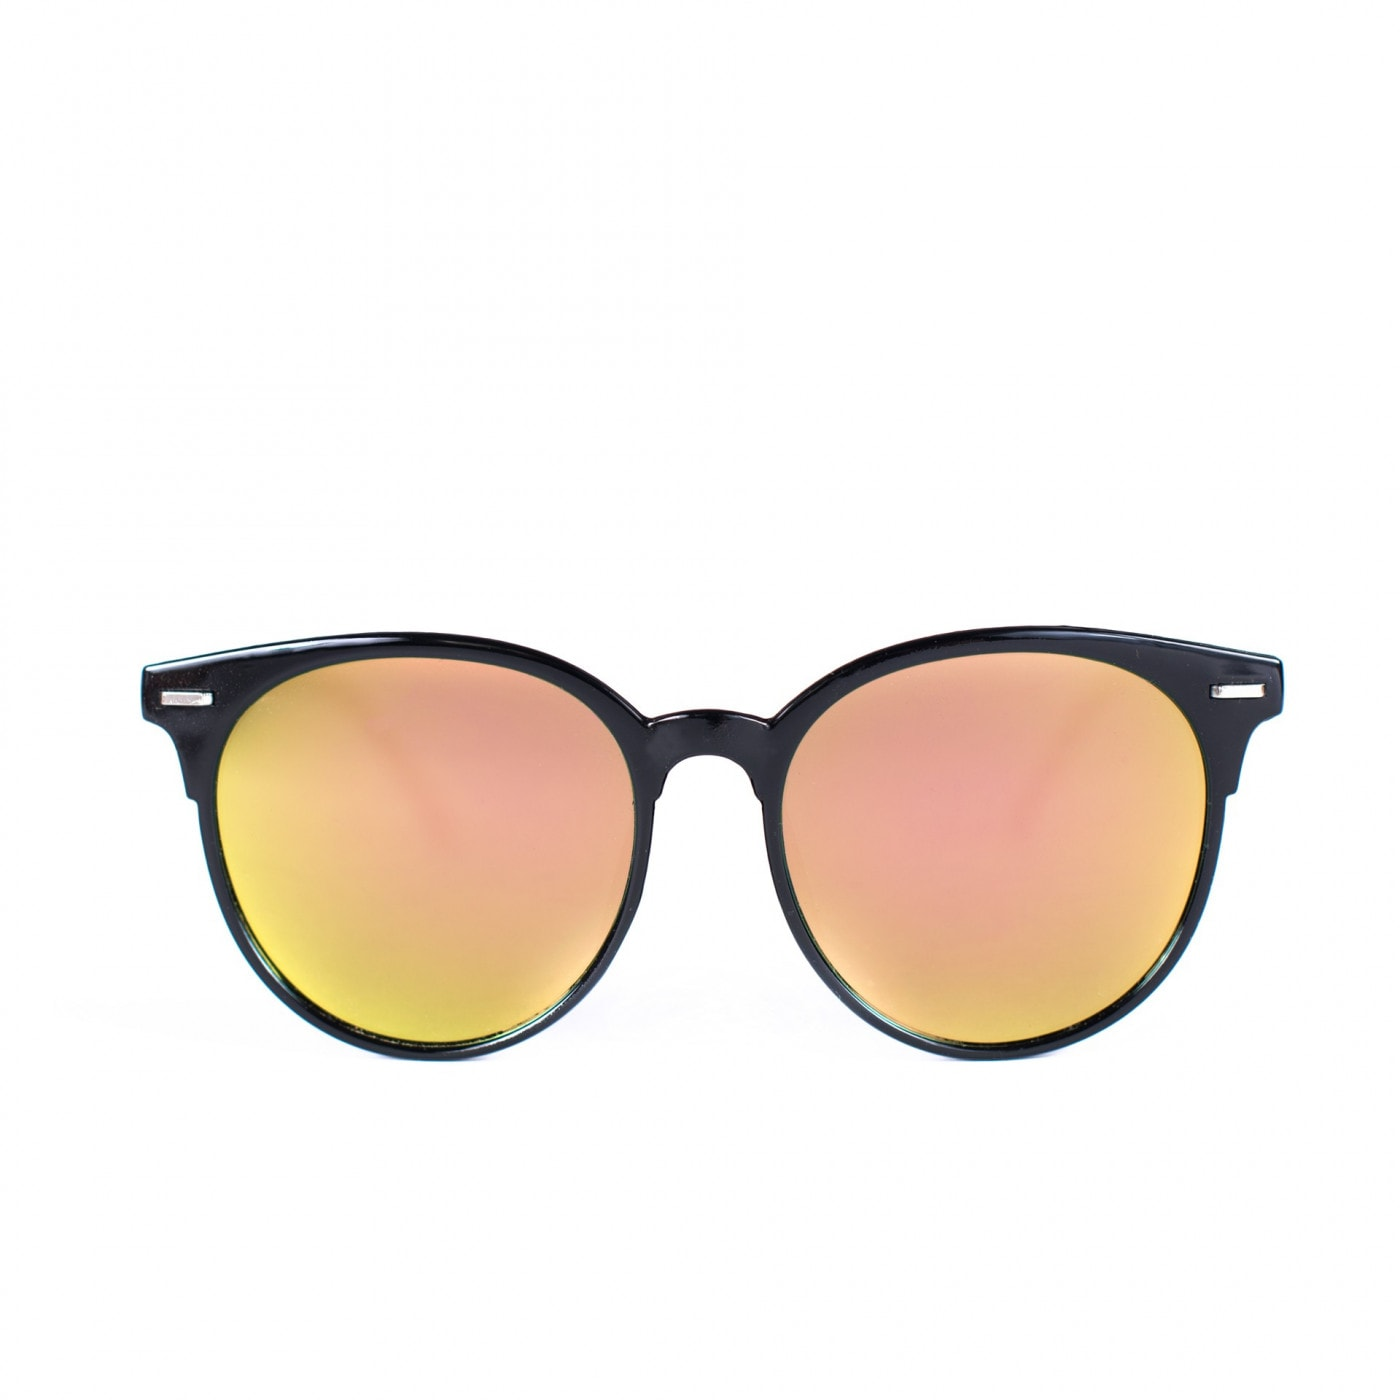 Art Of Polo Woman's Sunglasses ok19200 Black/Pink